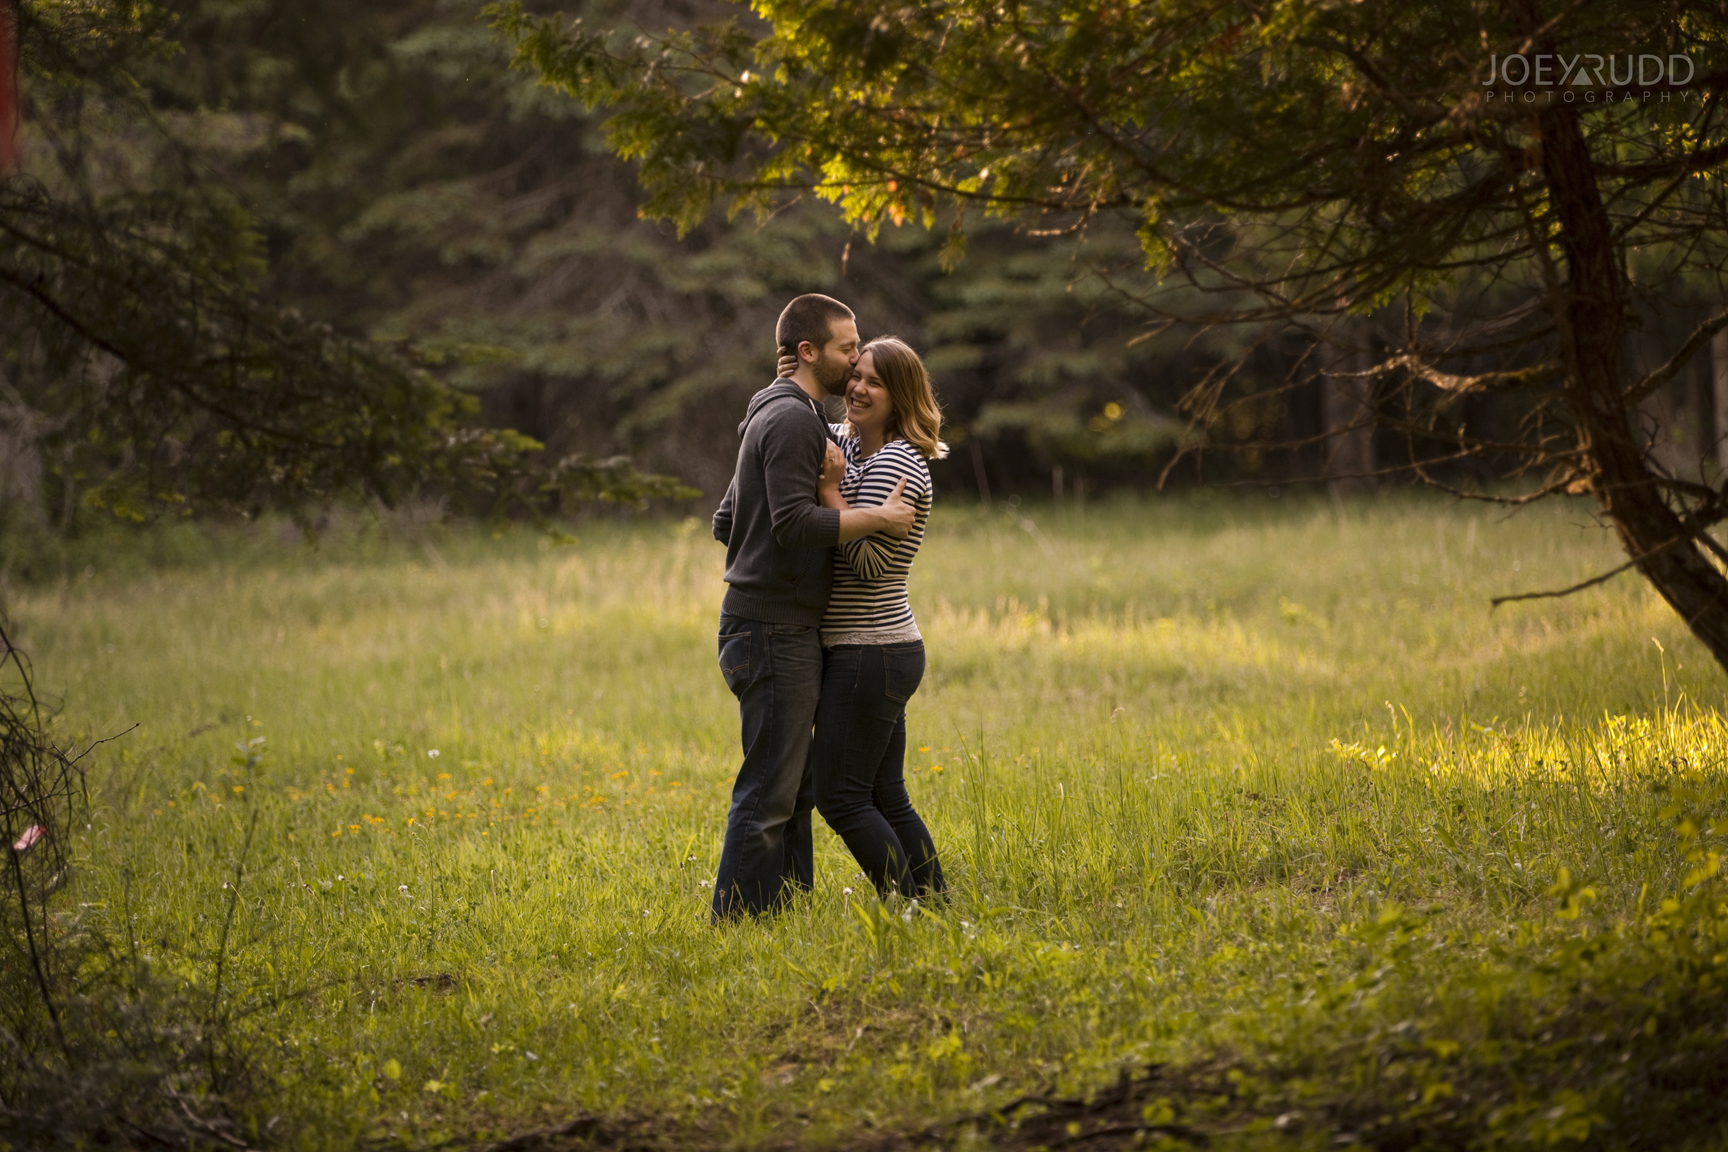 Rustic Engagement by Ottawa Wedding Photographer Joey Rudd Photography Nature Candid